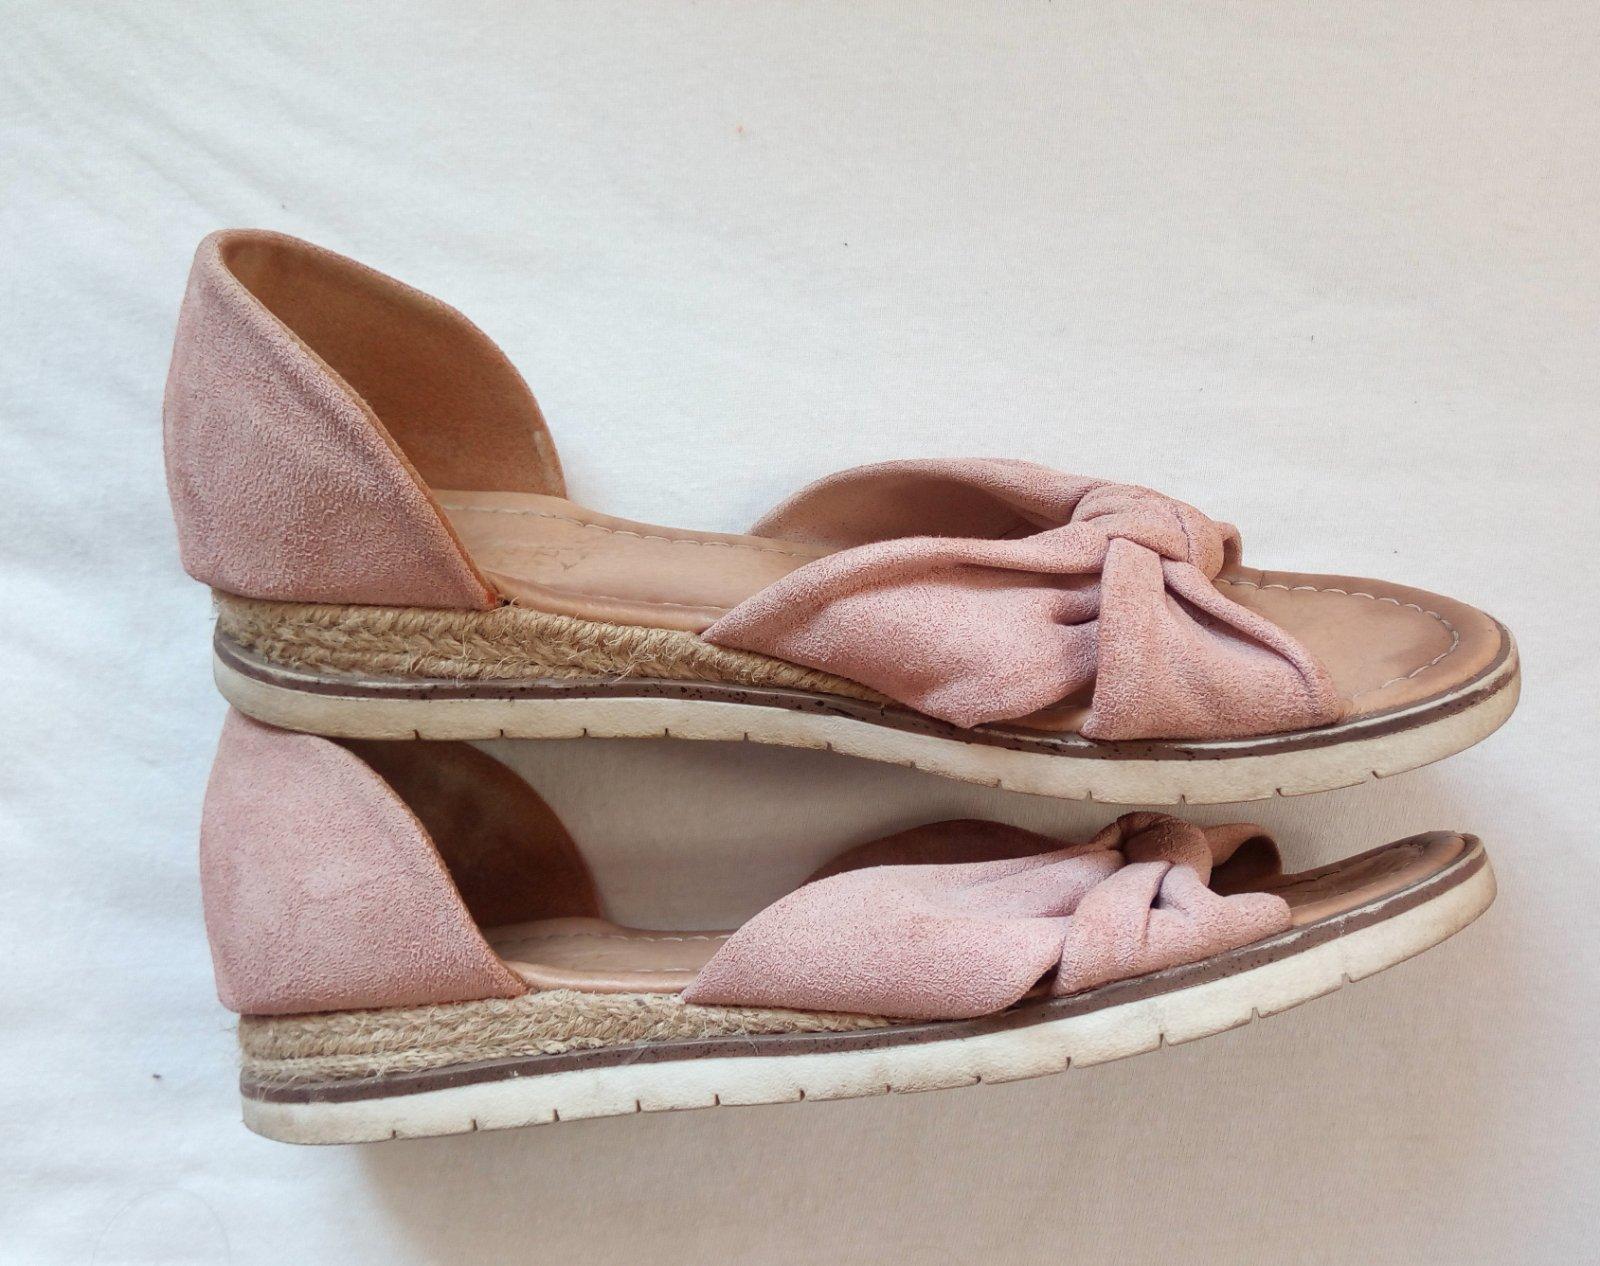 Bledoružové sandálky 38 - Obrázok č. 2